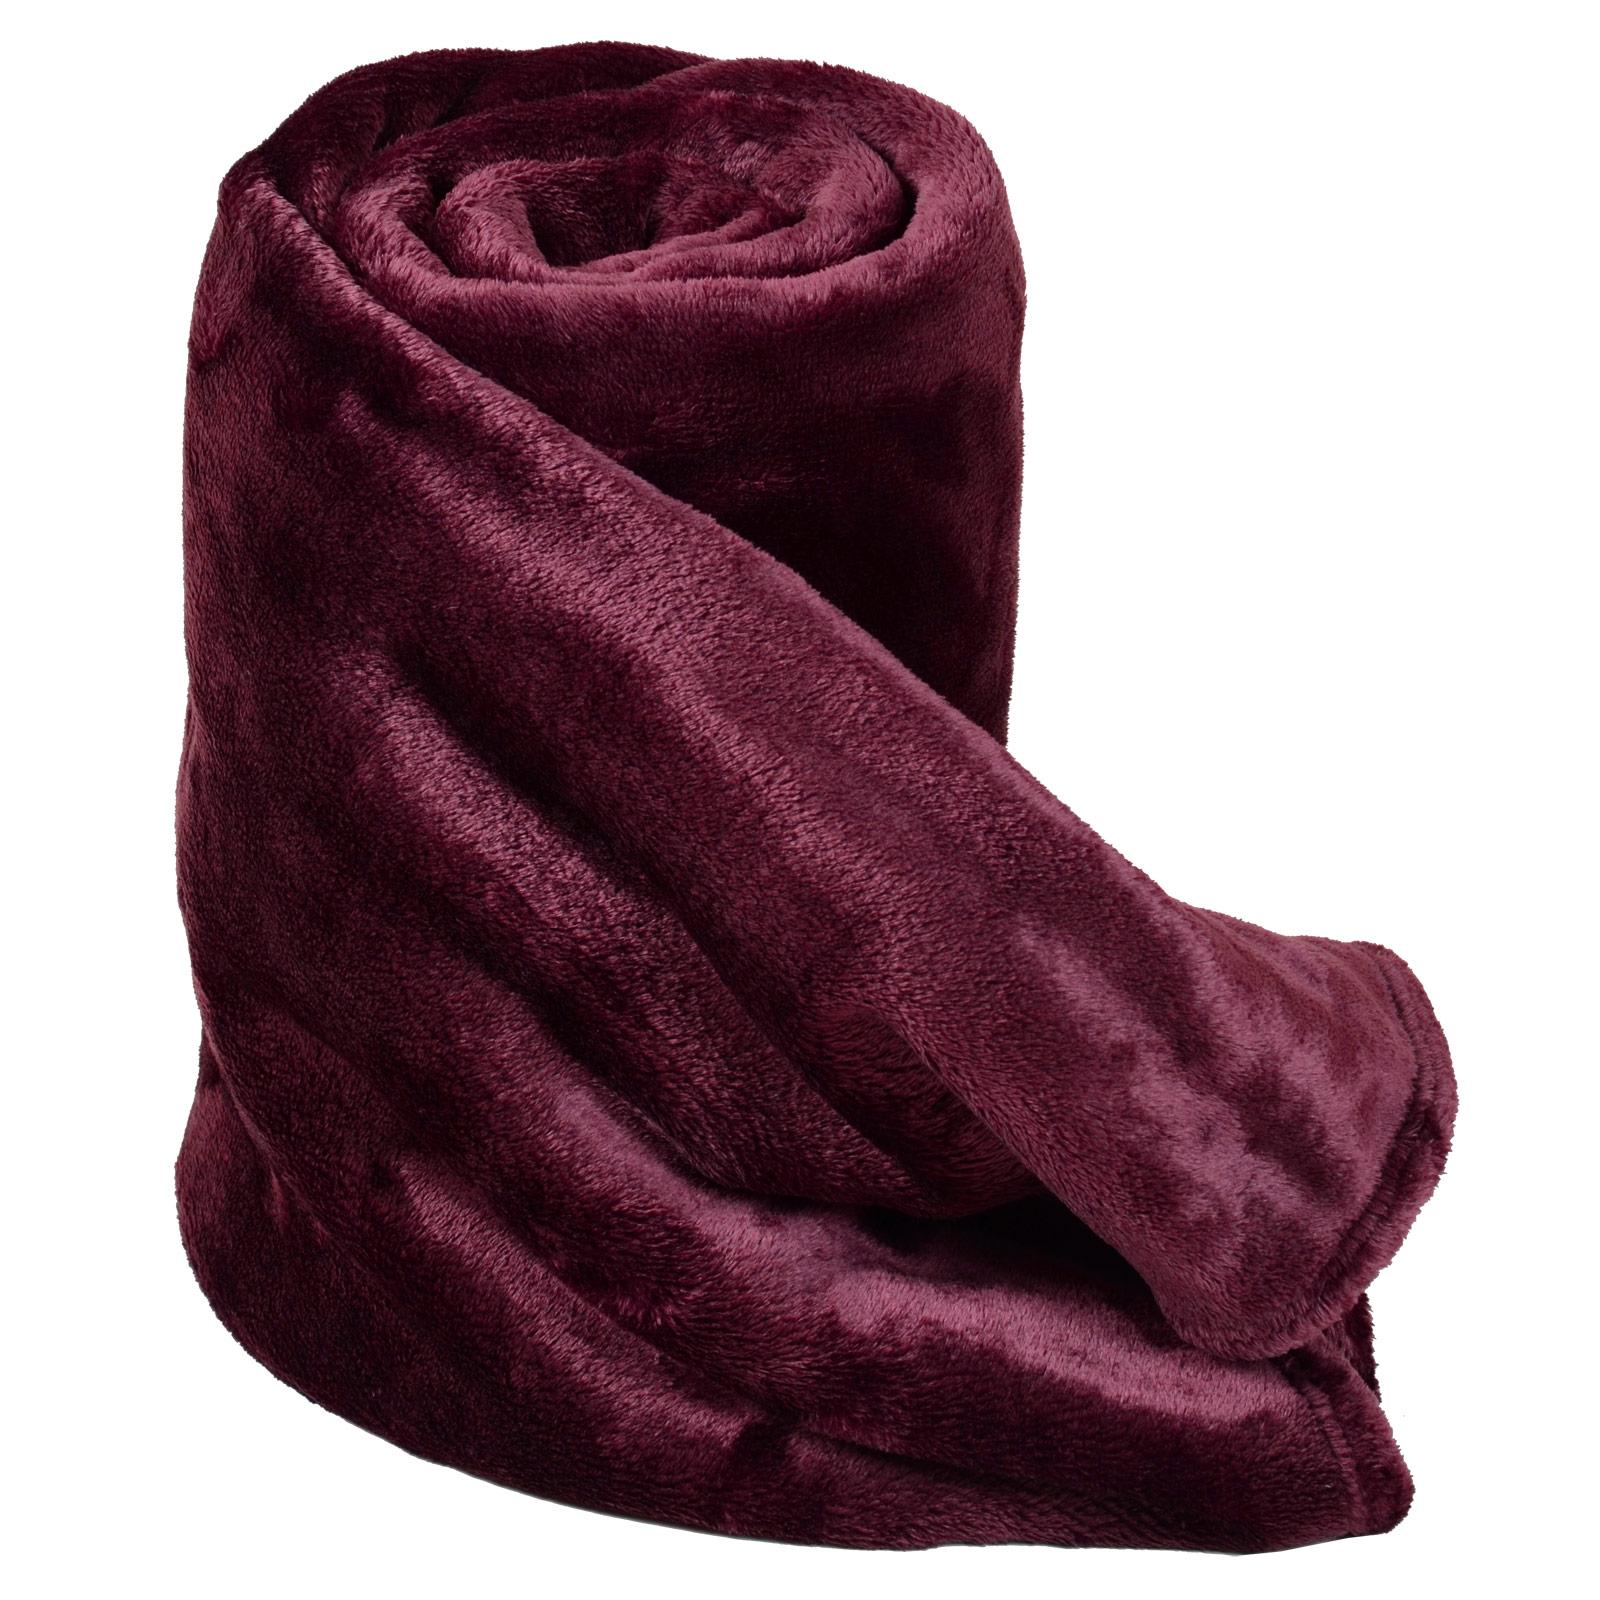 Fleece Blanket Super Soft Luxury Warm Home Sofa Bed Throw  : XS28502855 11600 from www.ebay.co.uk size 1600 x 1600 jpeg 413kB